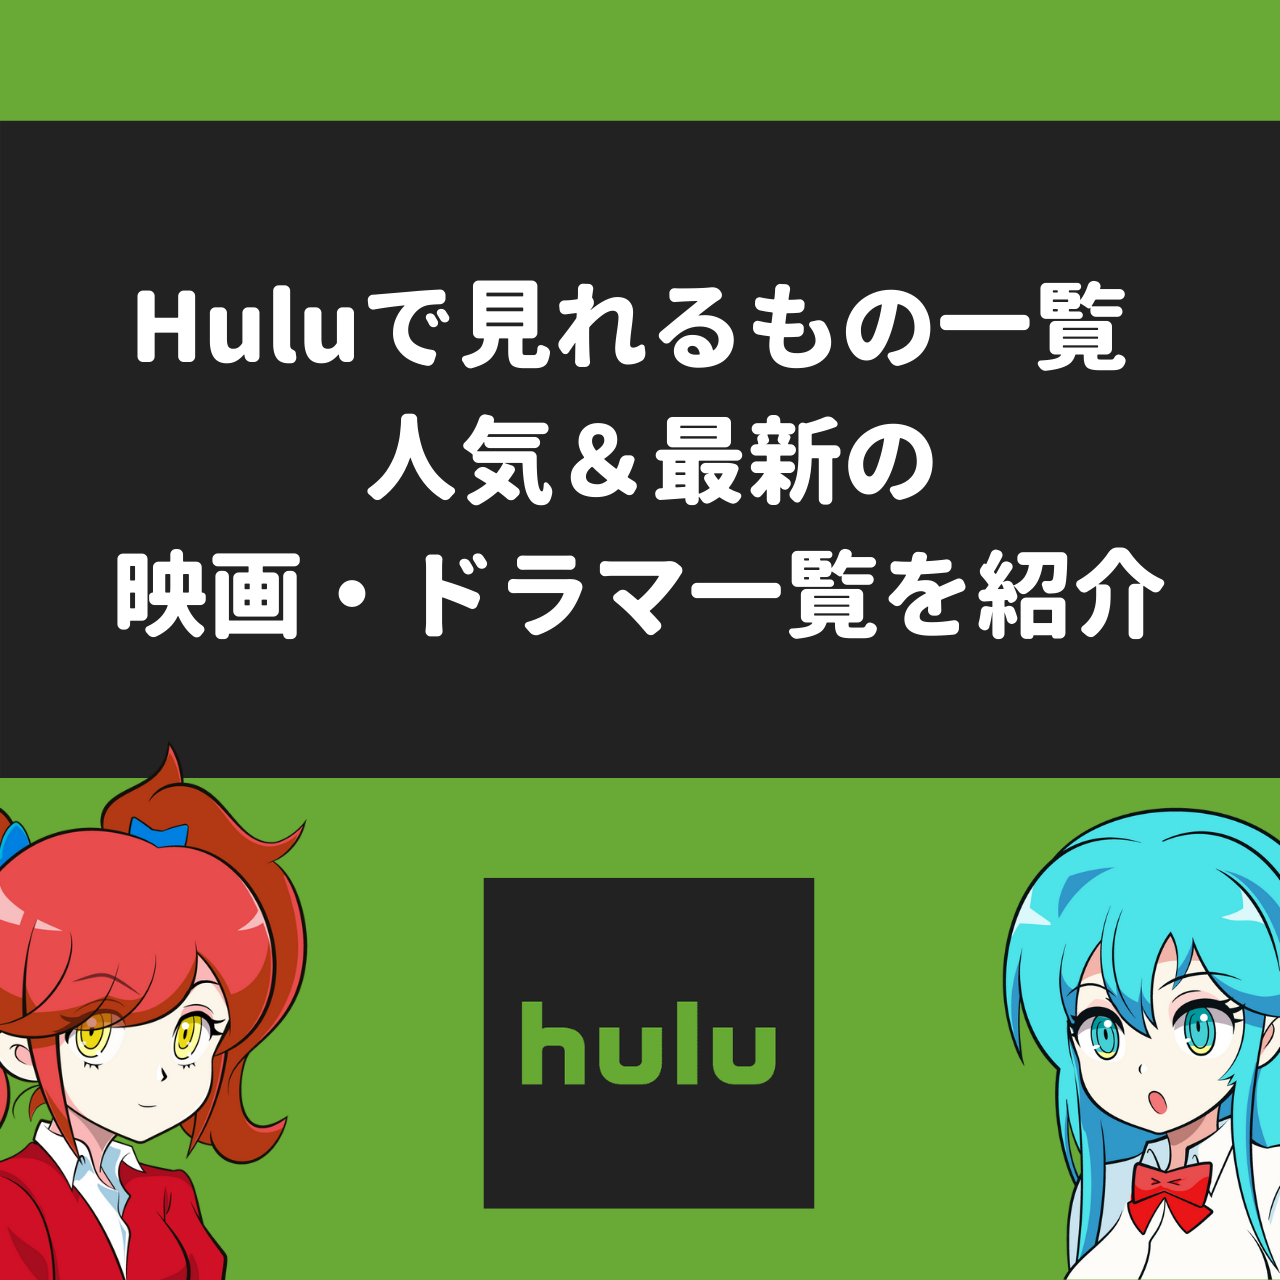 Huluで見れるもの一覧 | 人気&最新の映画・ドラマ一覧を紹介